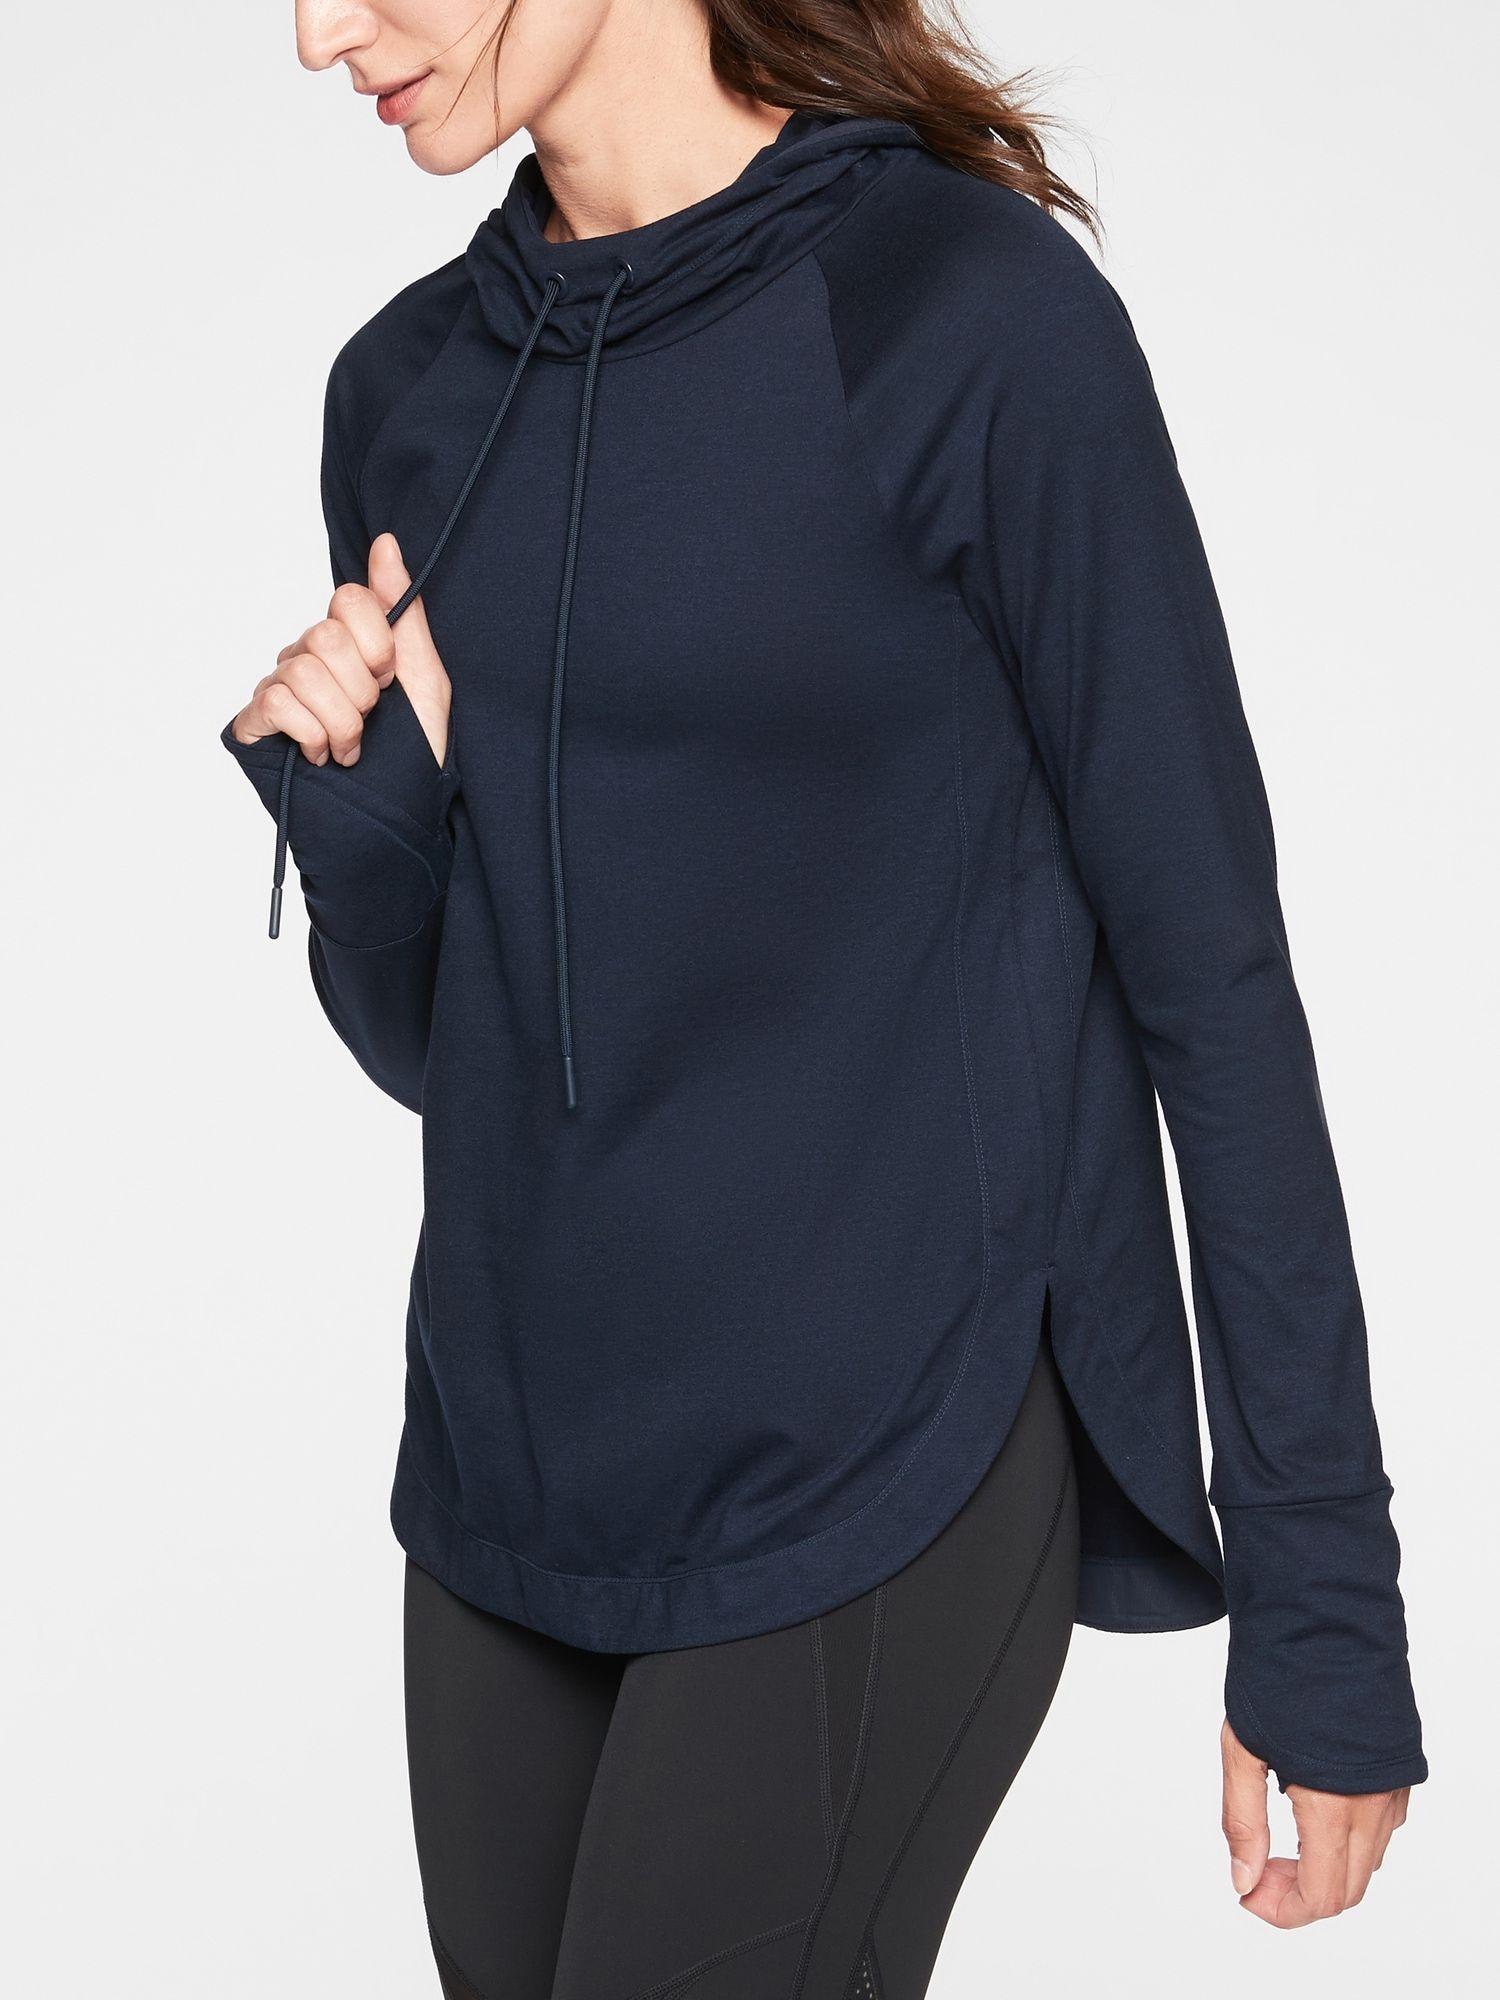 Uptempo Hoodie Sweatshirt Athleta In 2021 Sweatshirts Hoodie Workout Hoodie Sweatshirts [ 2000 x 1500 Pixel ]